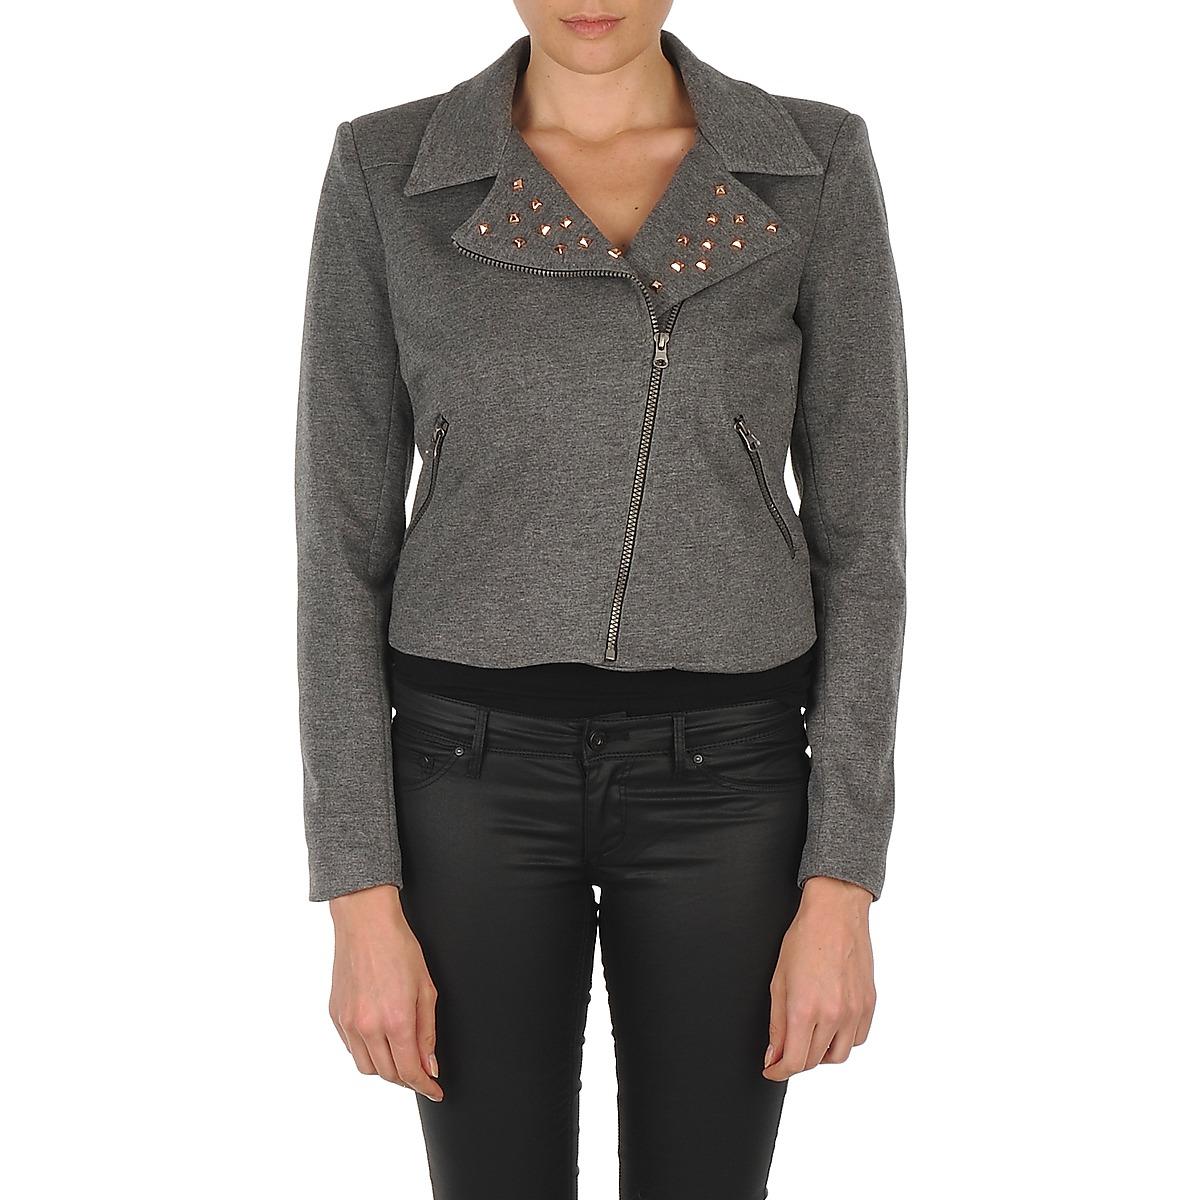 jackets blazers vero moda aya ls blazer grey free delivery with clothing. Black Bedroom Furniture Sets. Home Design Ideas